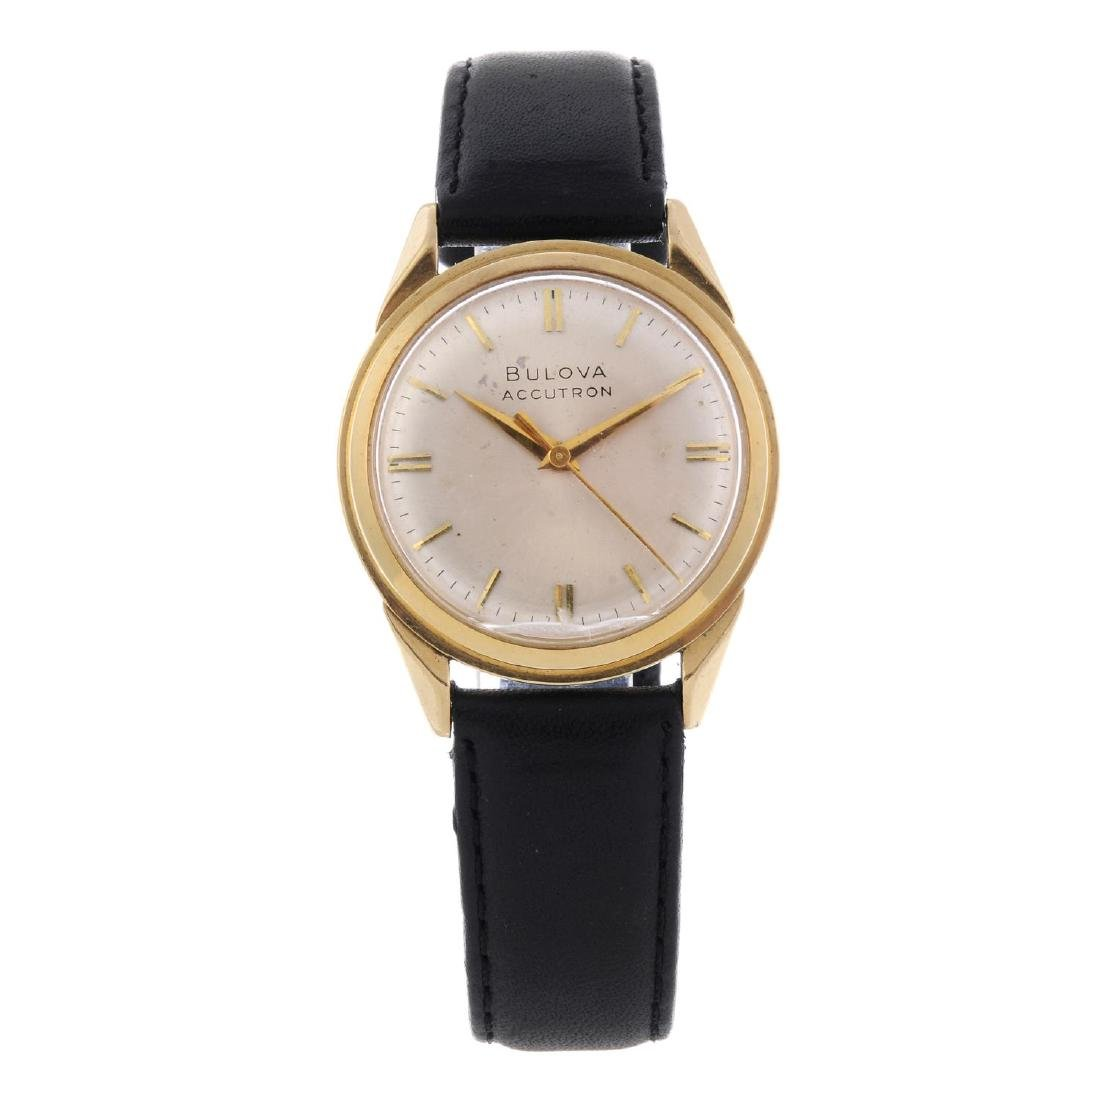 BULOVA - a gentleman's Accutron wrist watch. 18ct